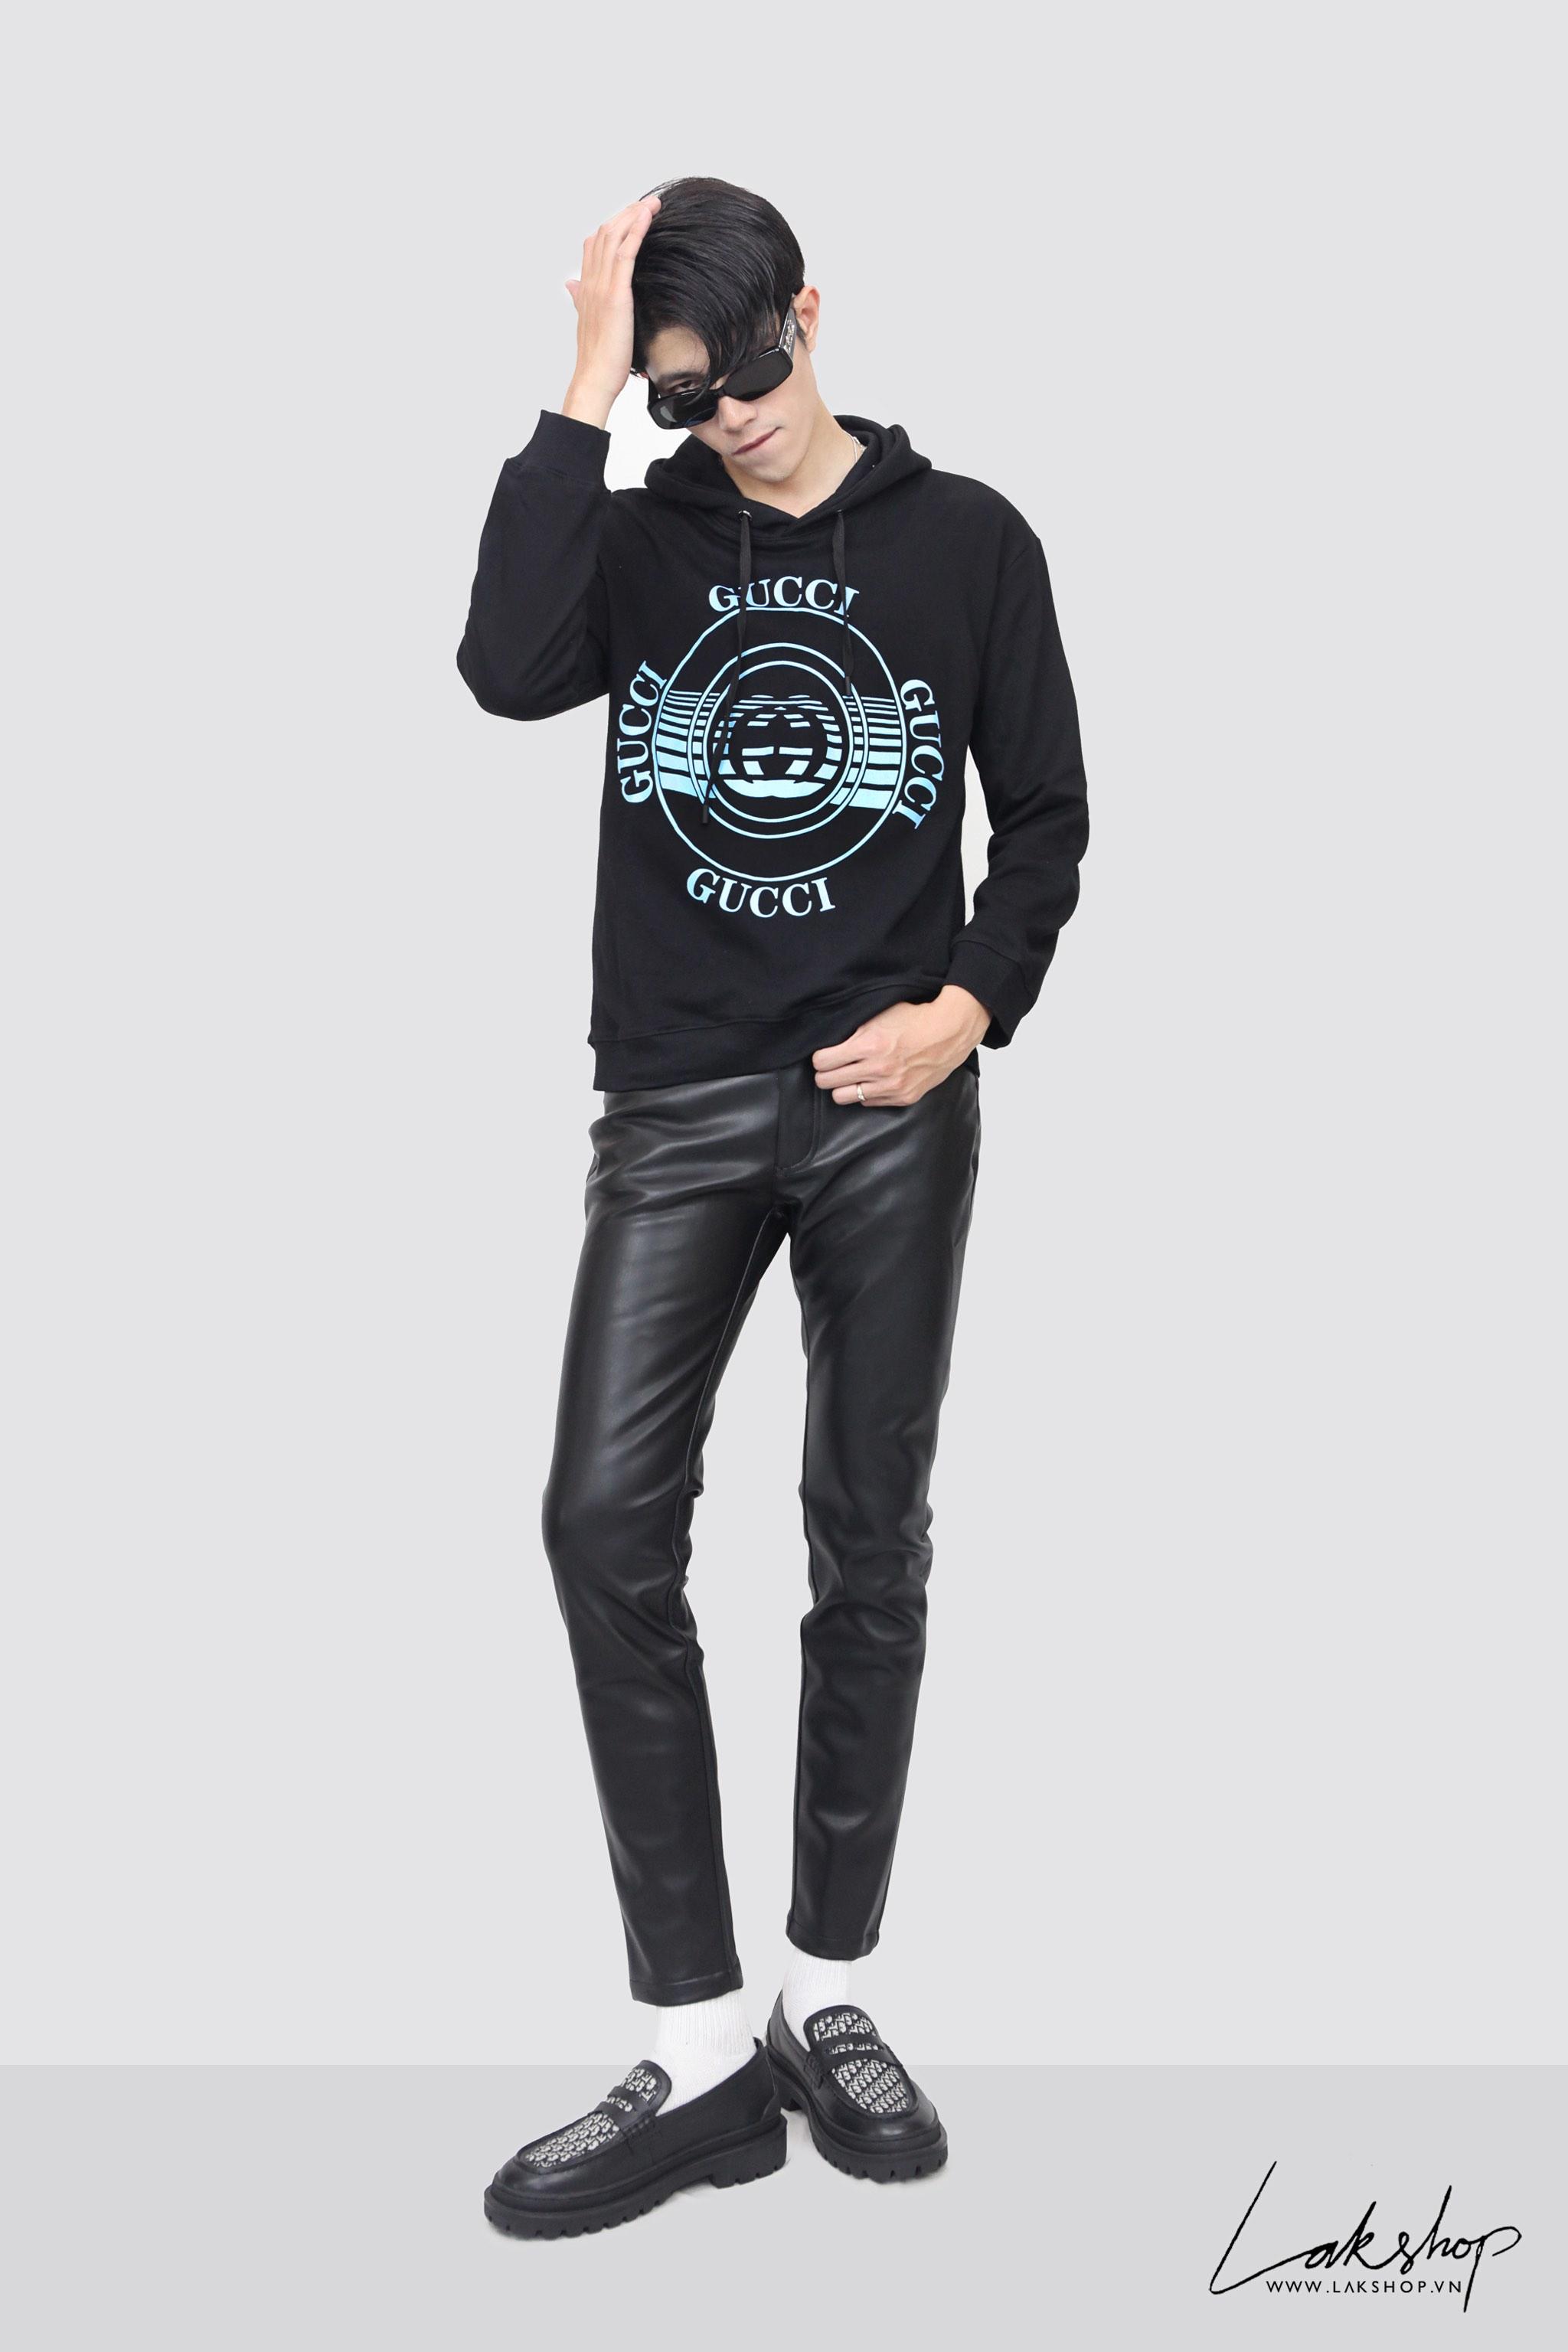 Gucci Logo Blue Square Oversized Hooded  Sưeatshirt  cv2